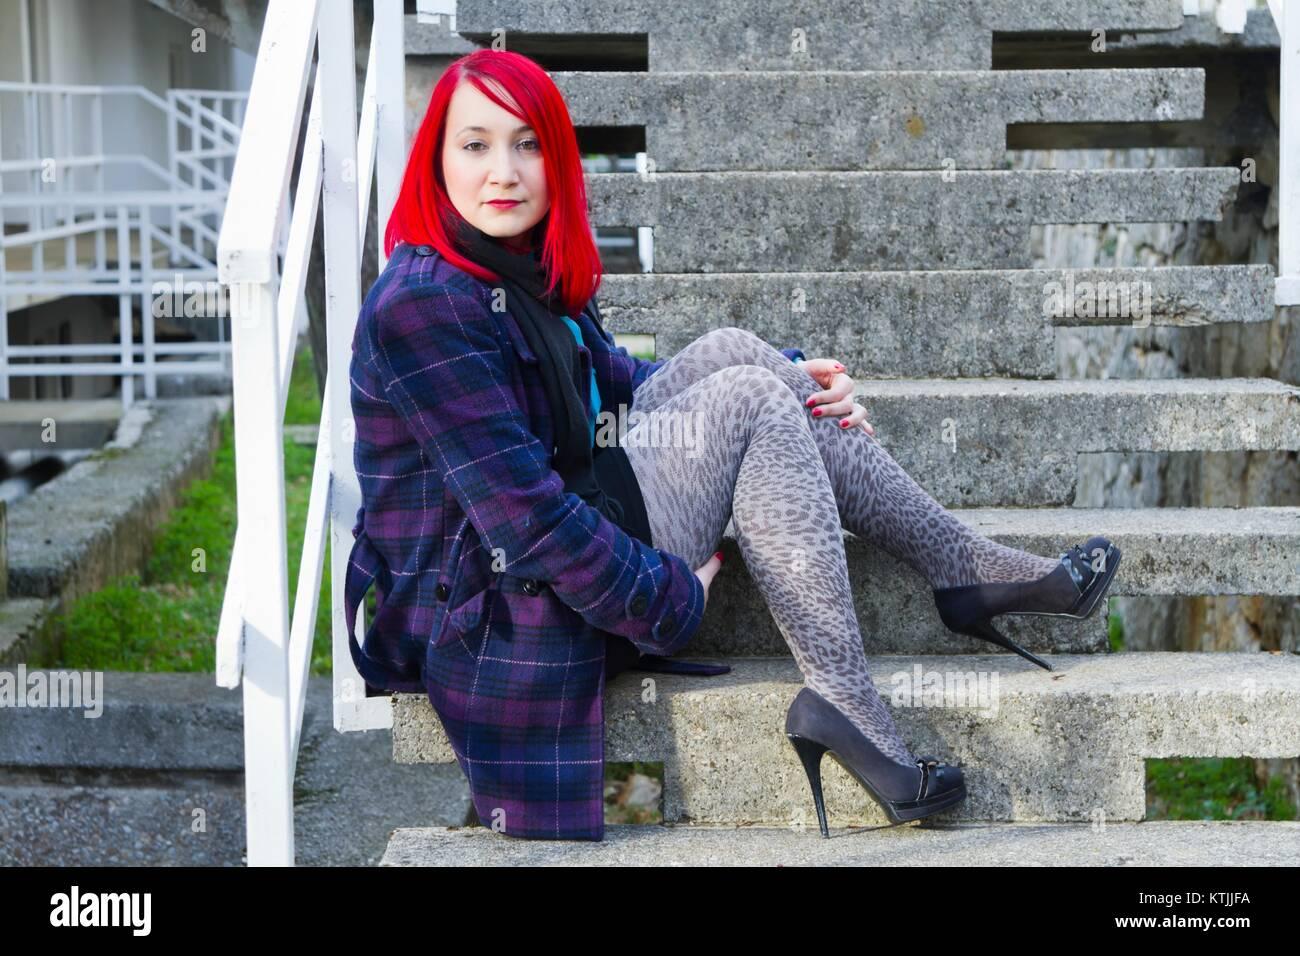 Feminine tightsaddict tightsaddicted Stock Photo